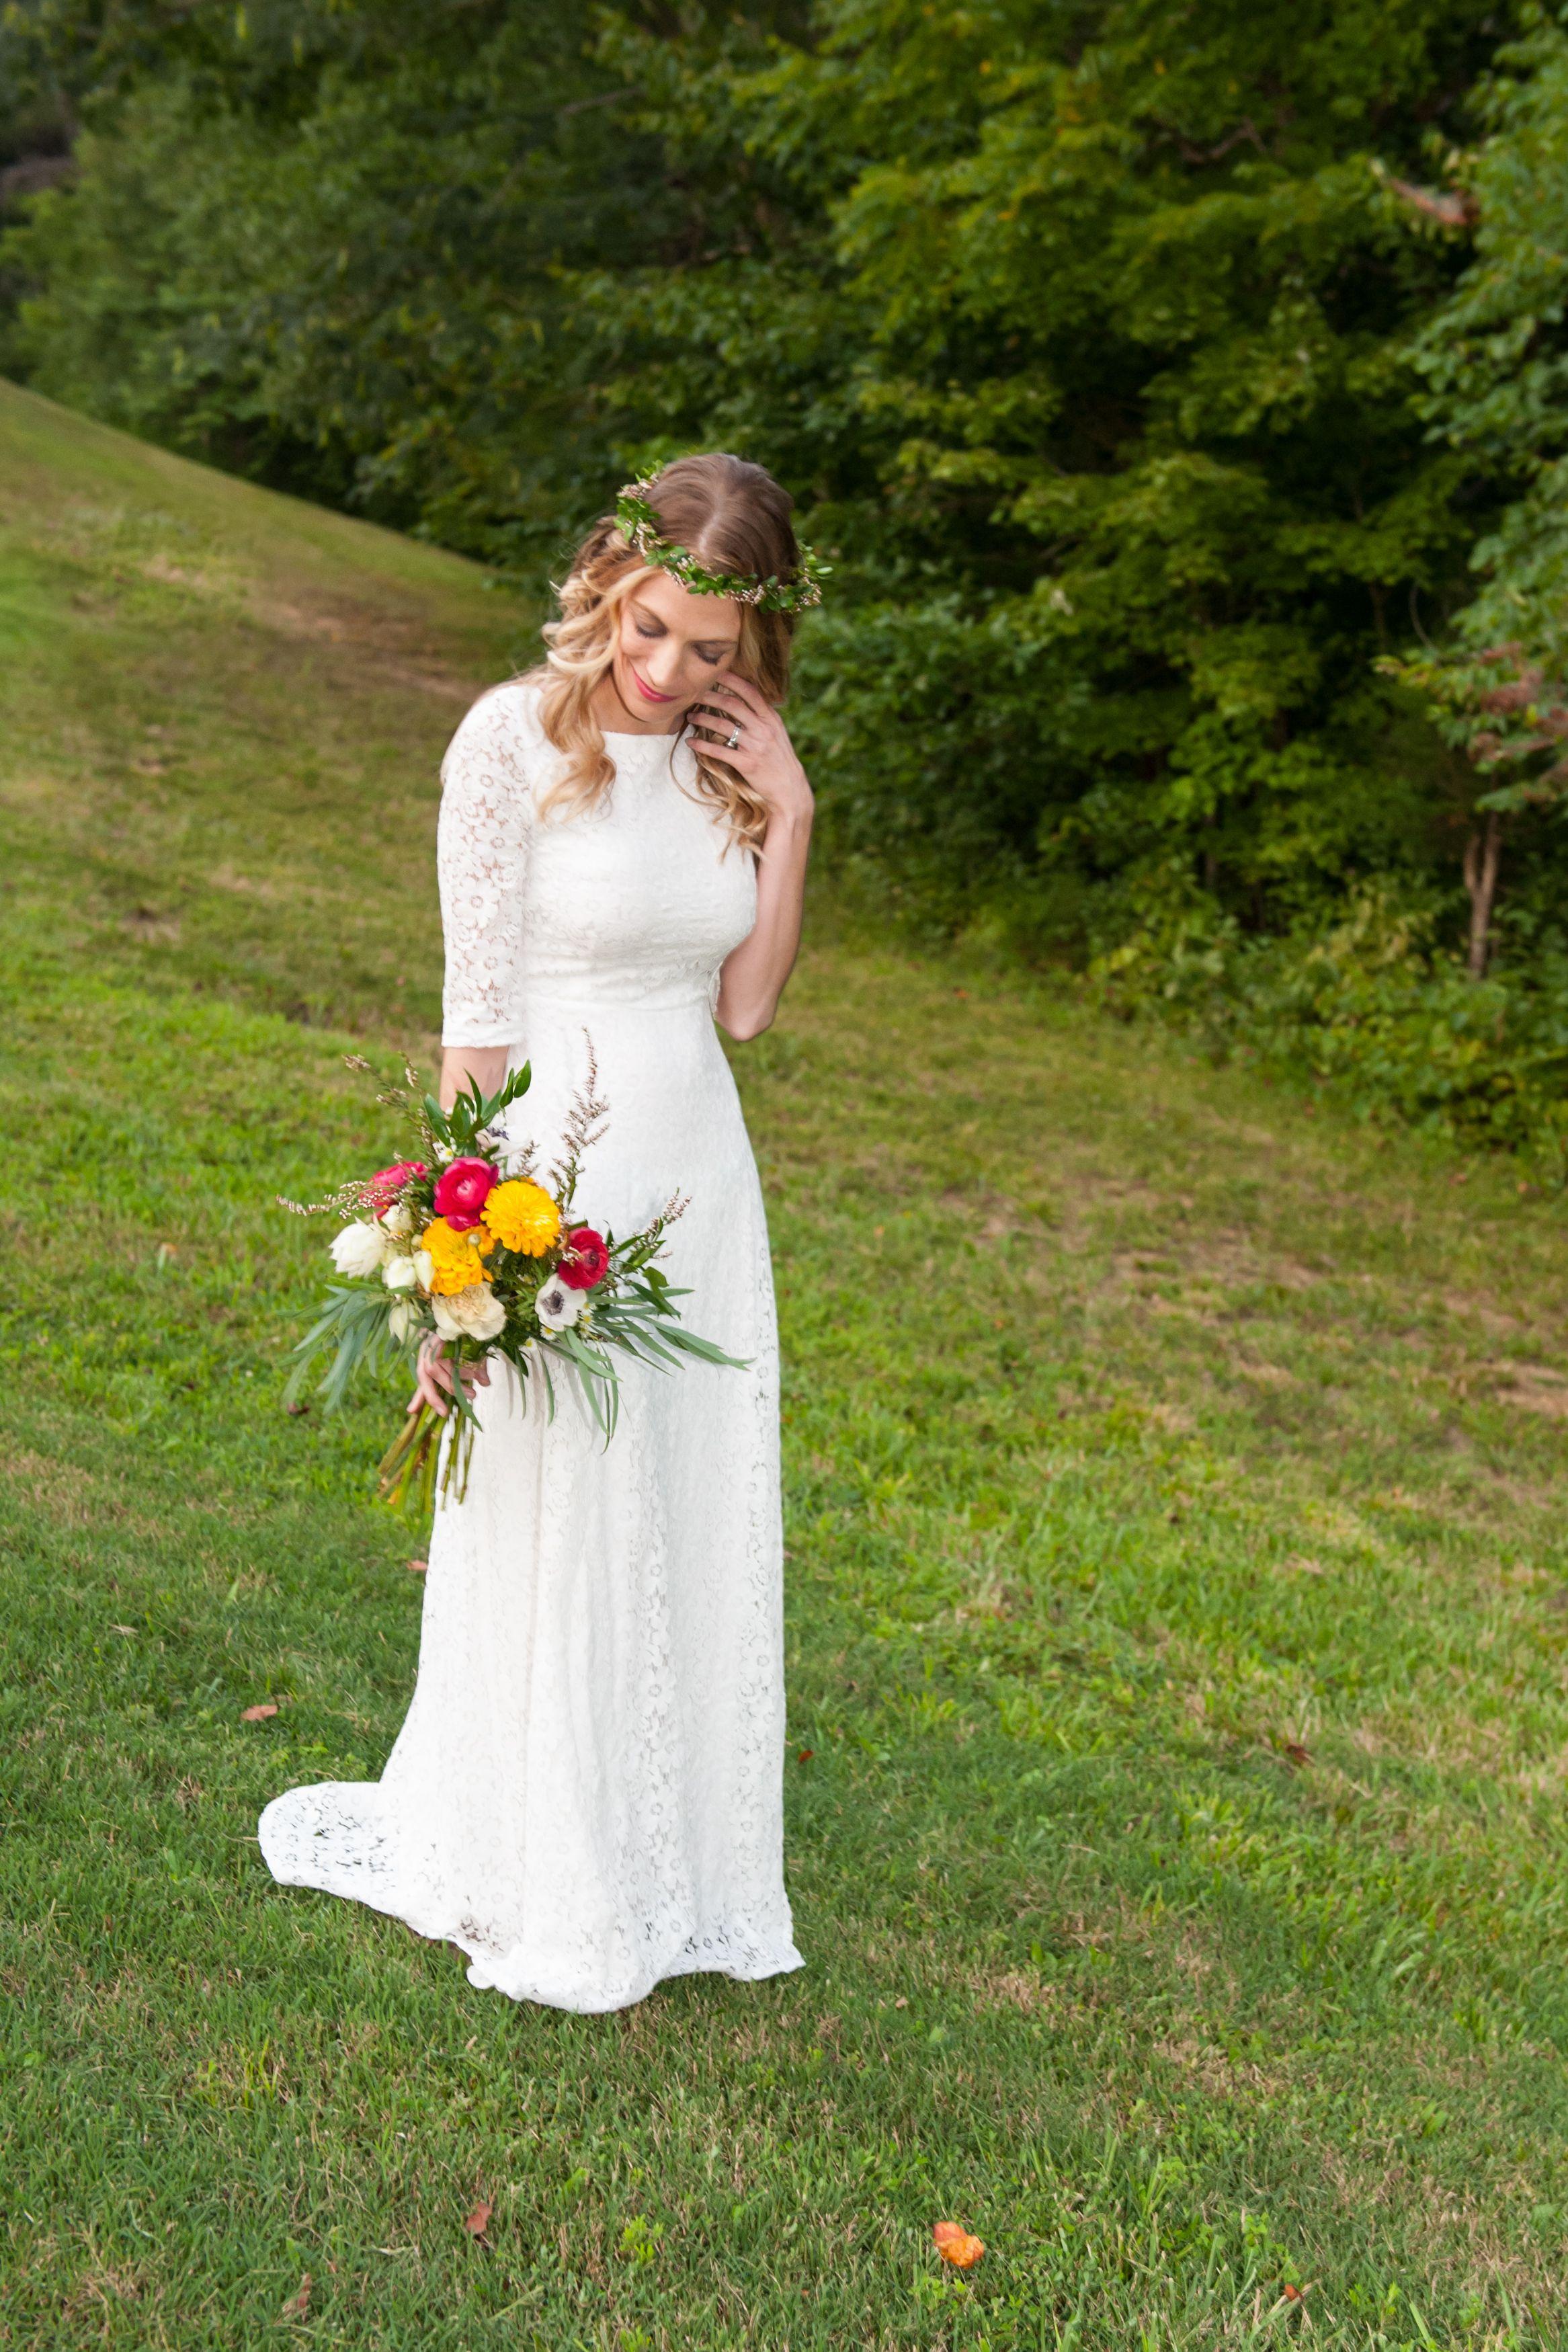 year vow renewal dress found on amazon modern boho bouquet